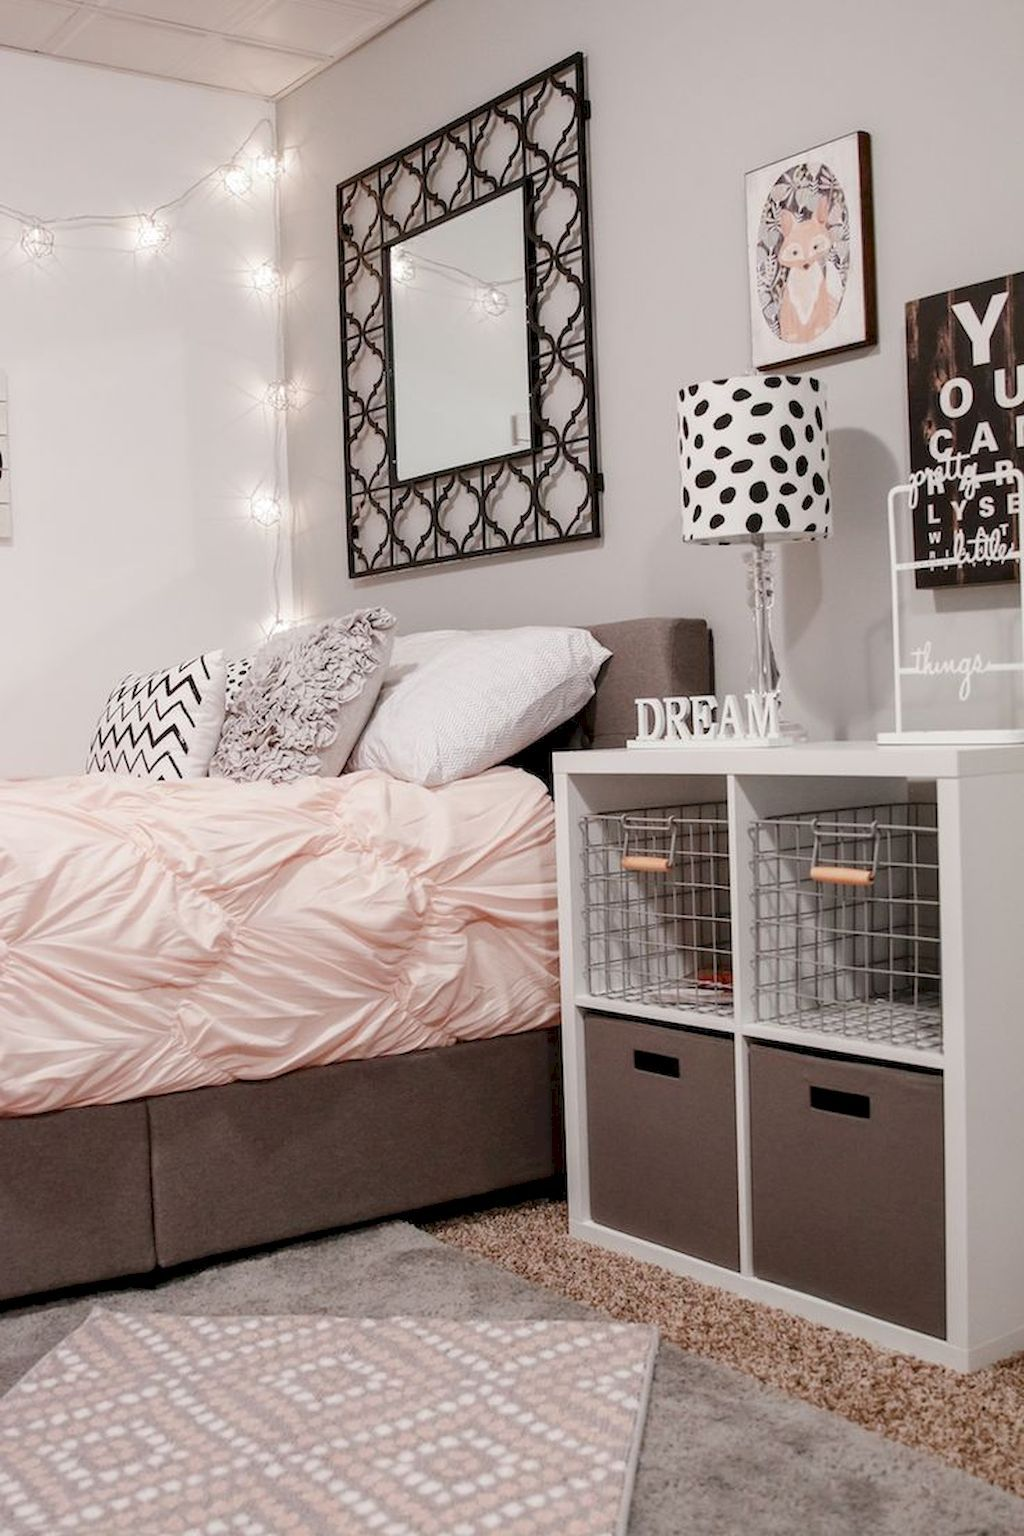 30 Amazing College Apartment Bedroom Decor Ideas 18